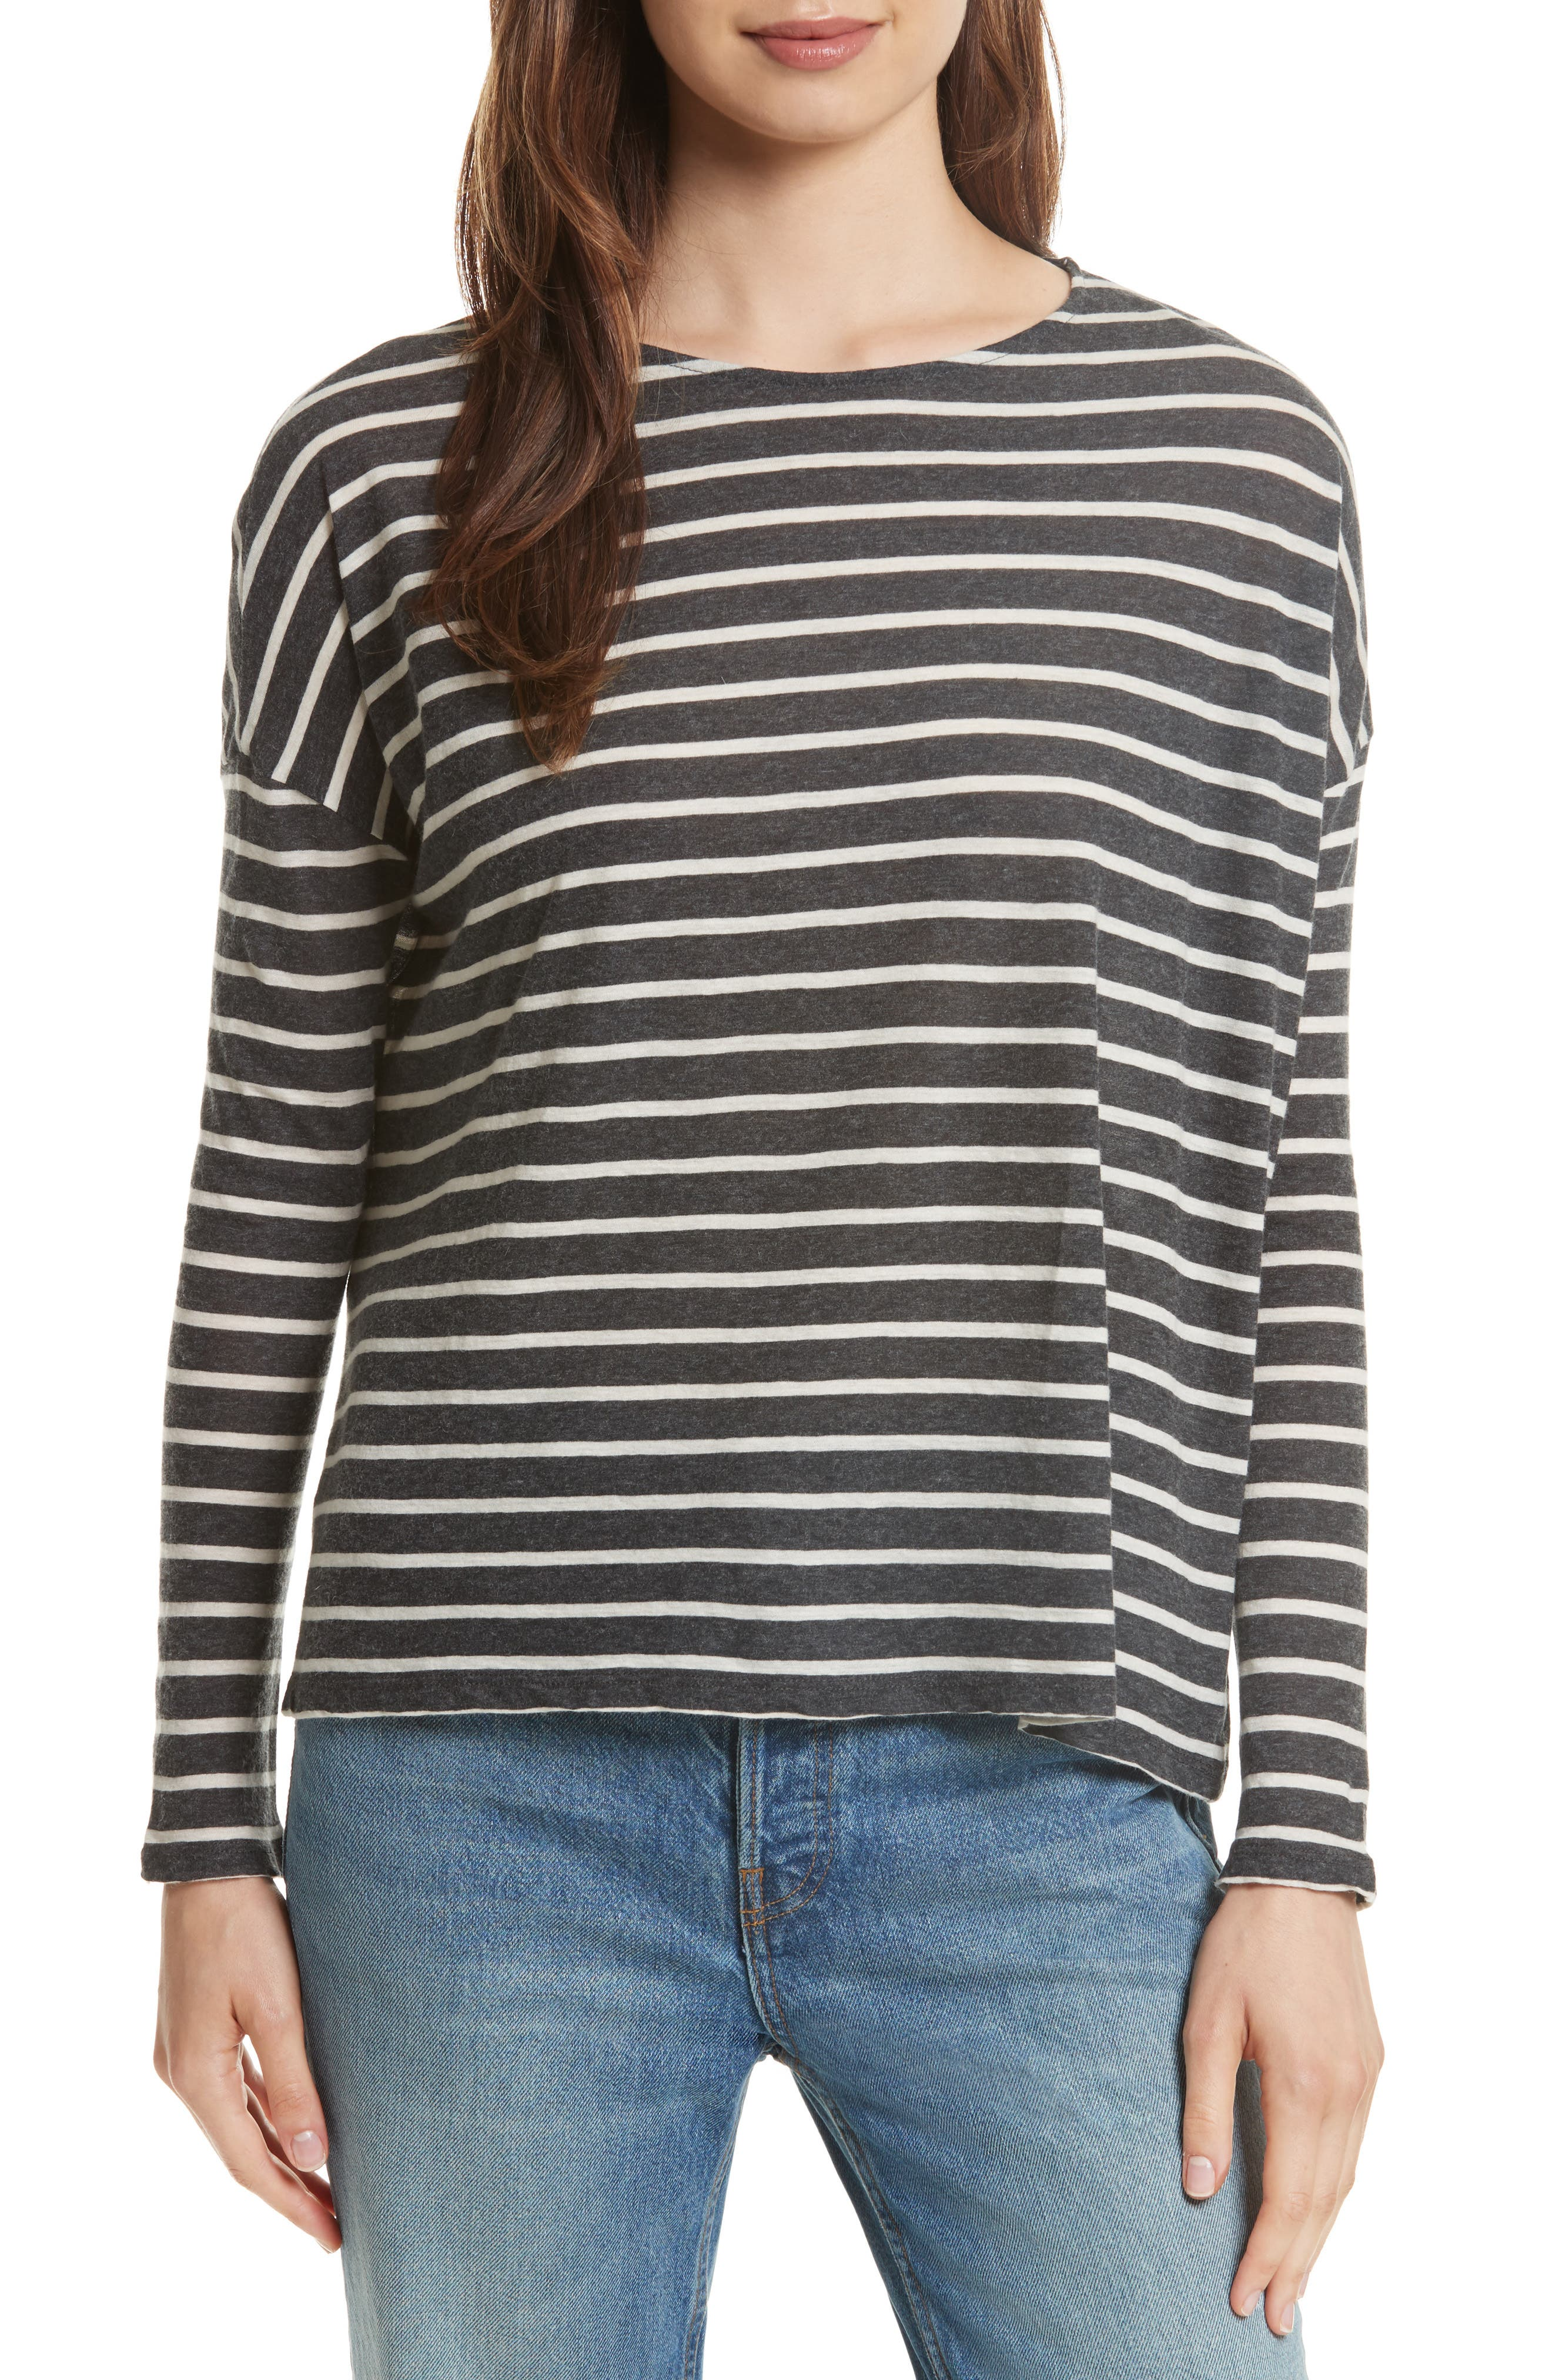 Majestic Filatures Stripe Cotton & Cashmere Boatneck Top